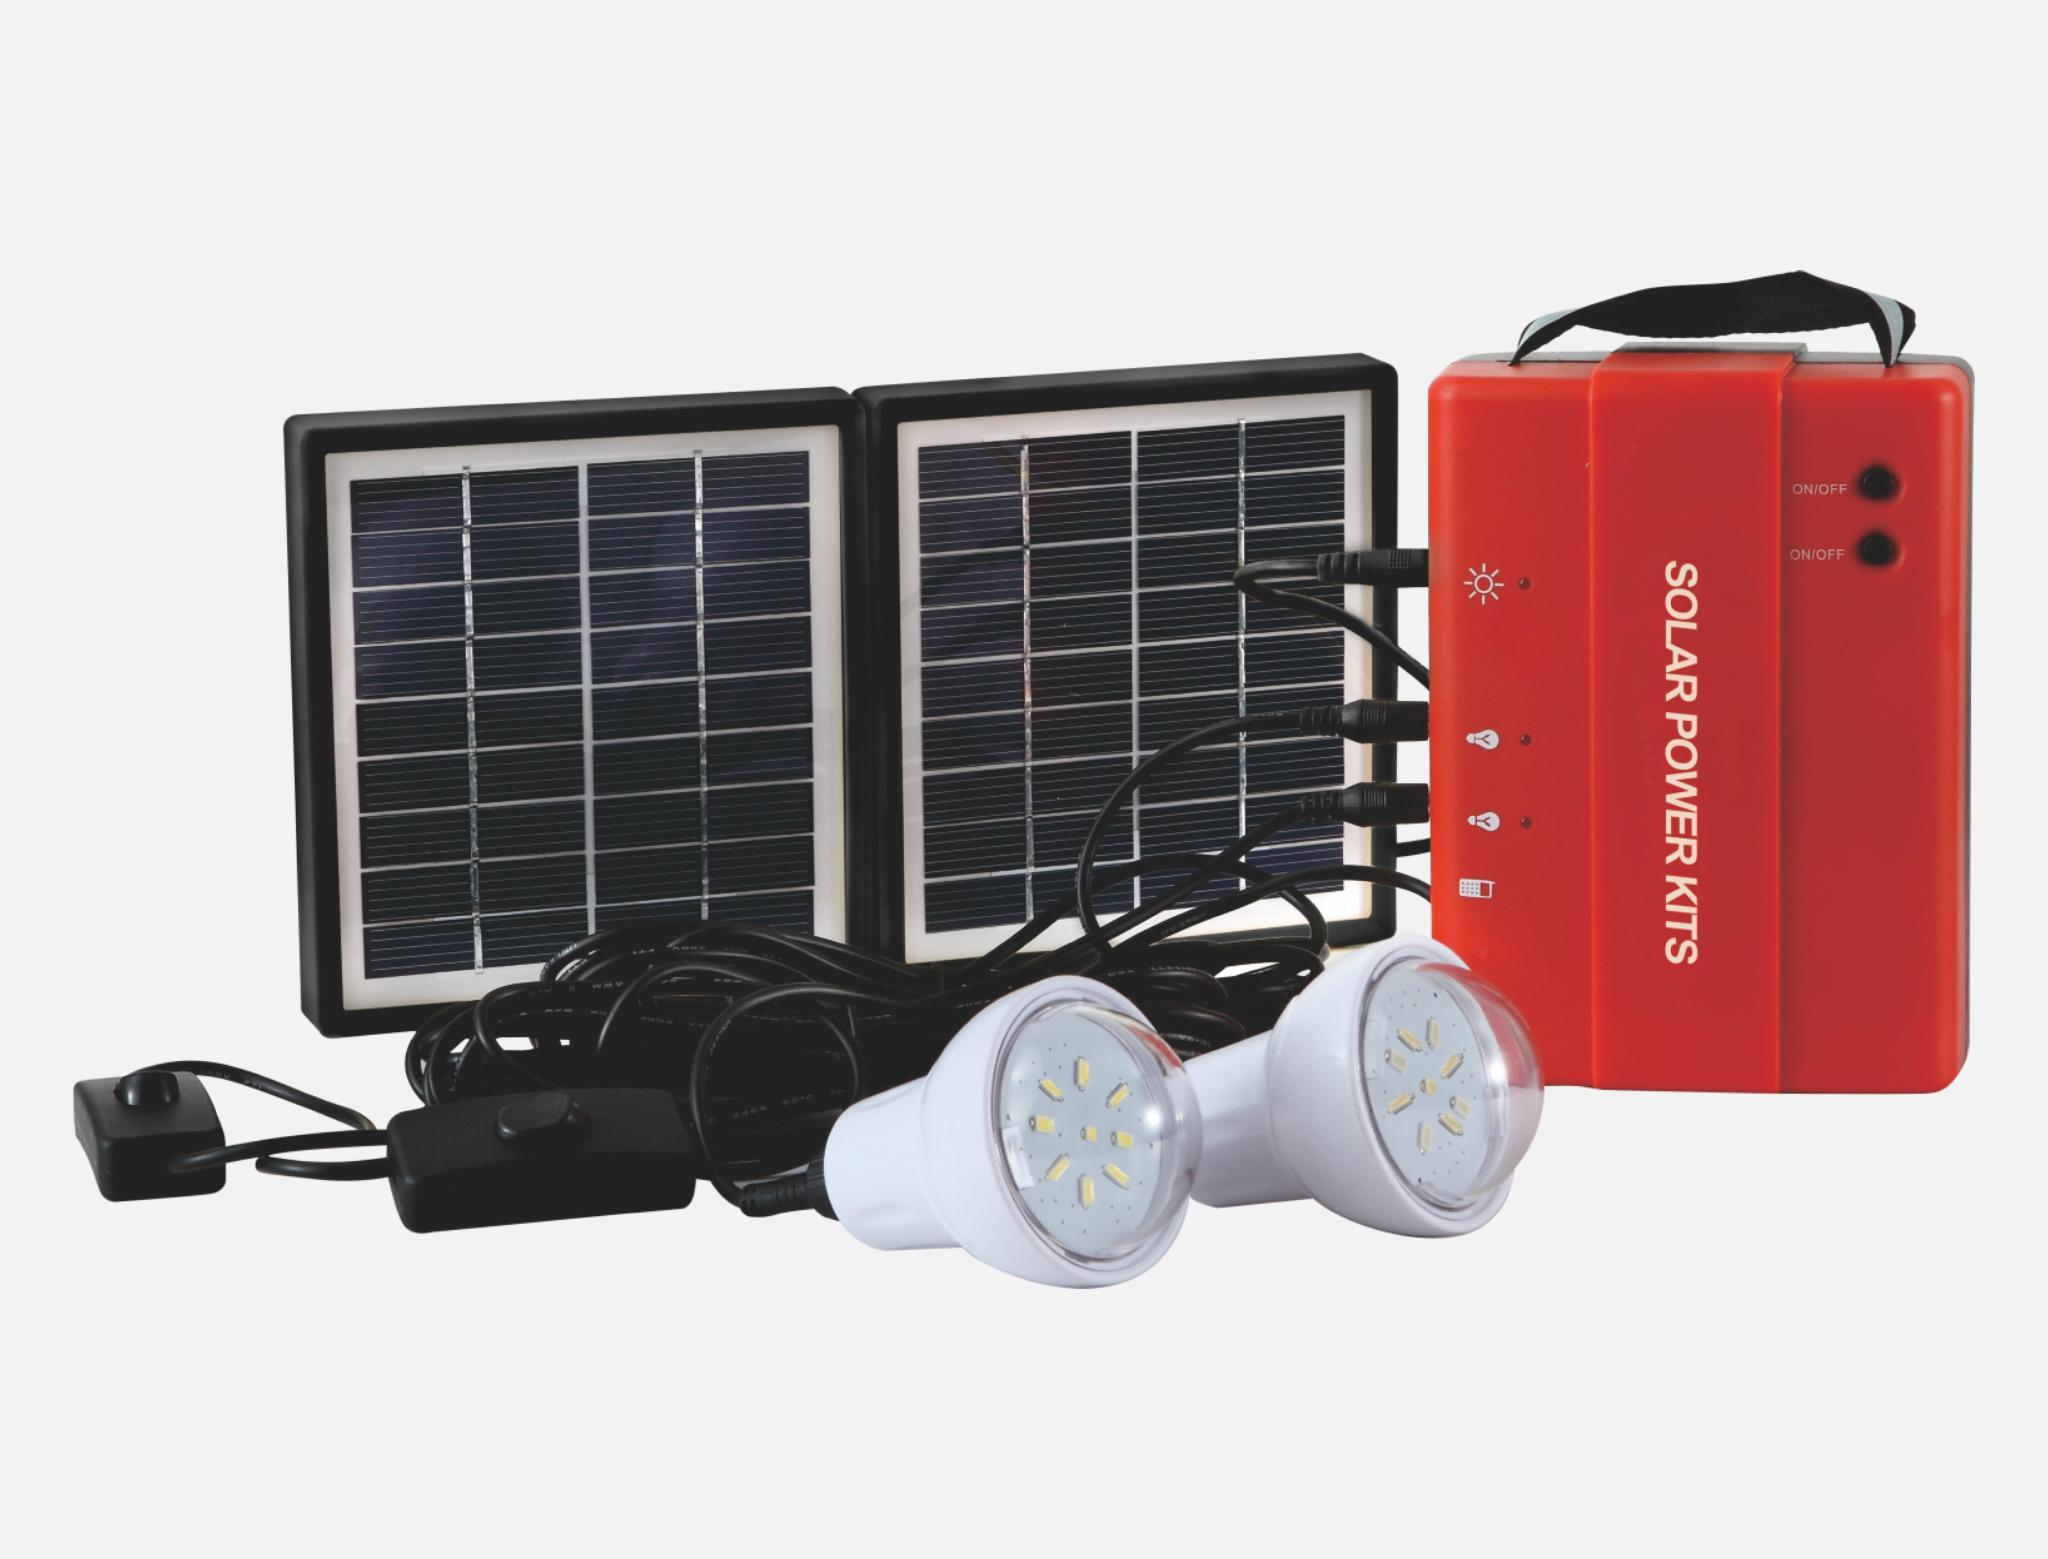 1.7W Solar Lighting Kit - 2 bulbs 1